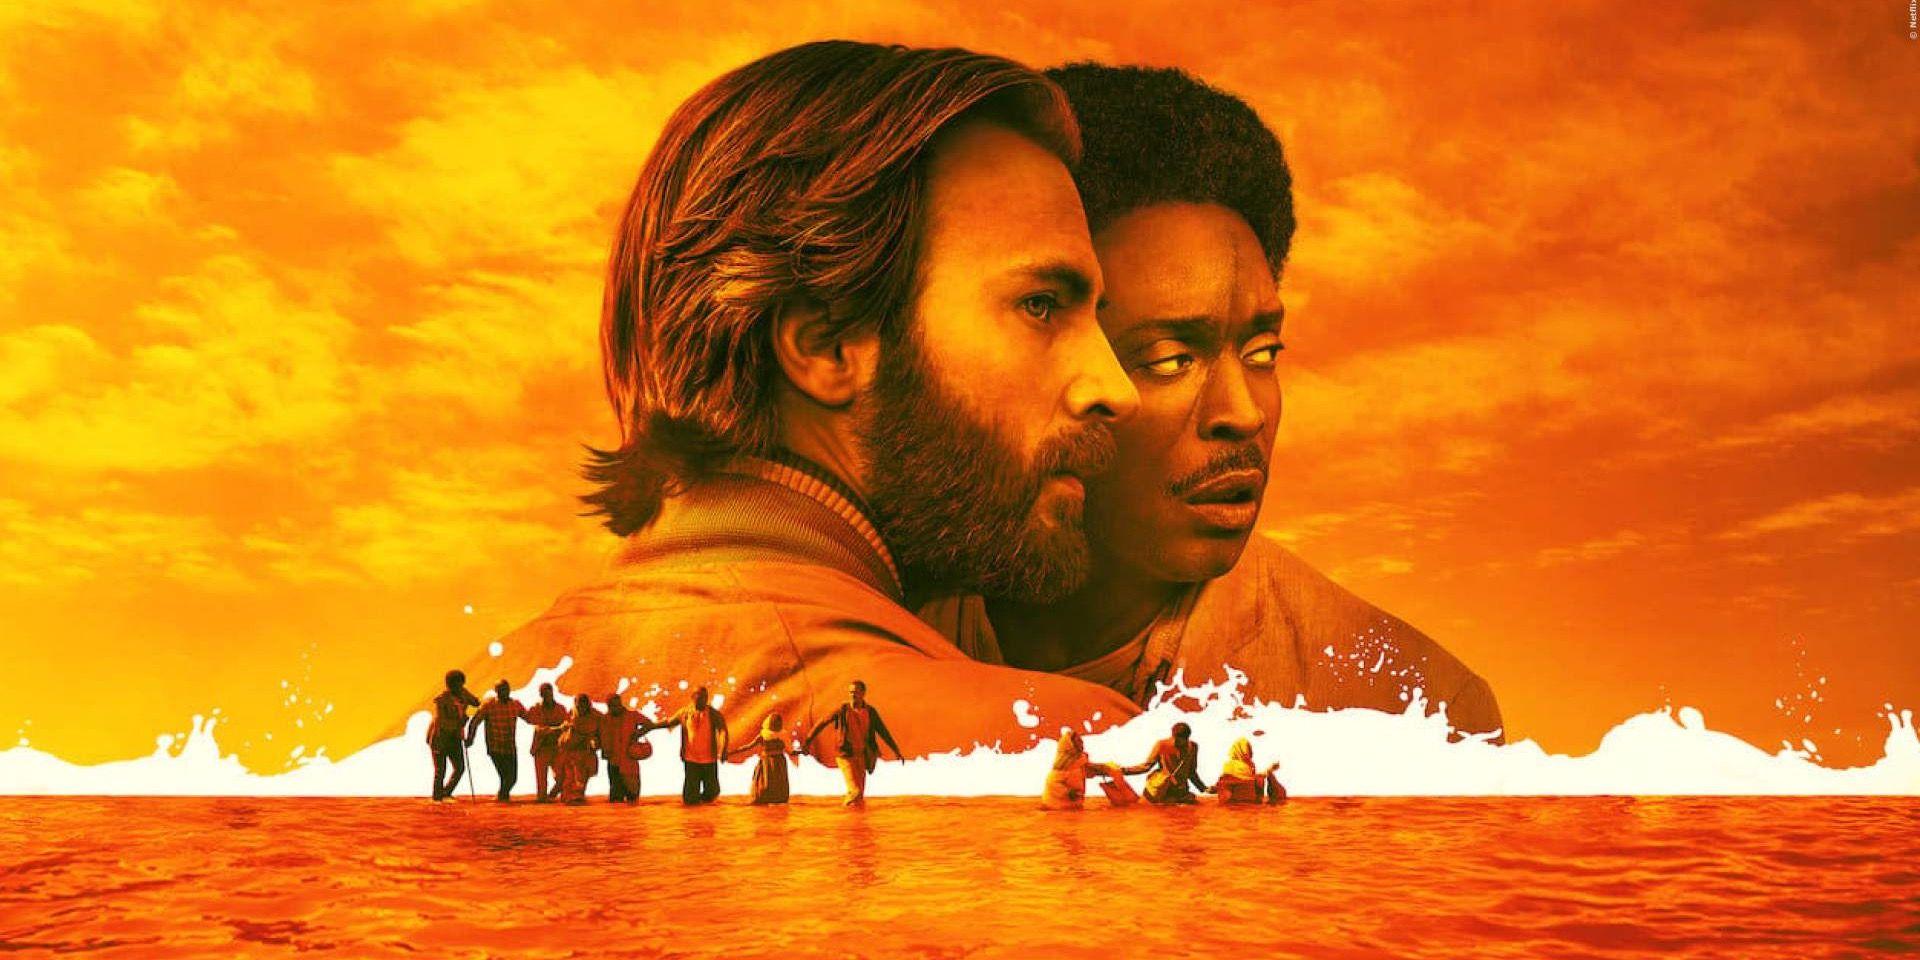 Red Sea Film